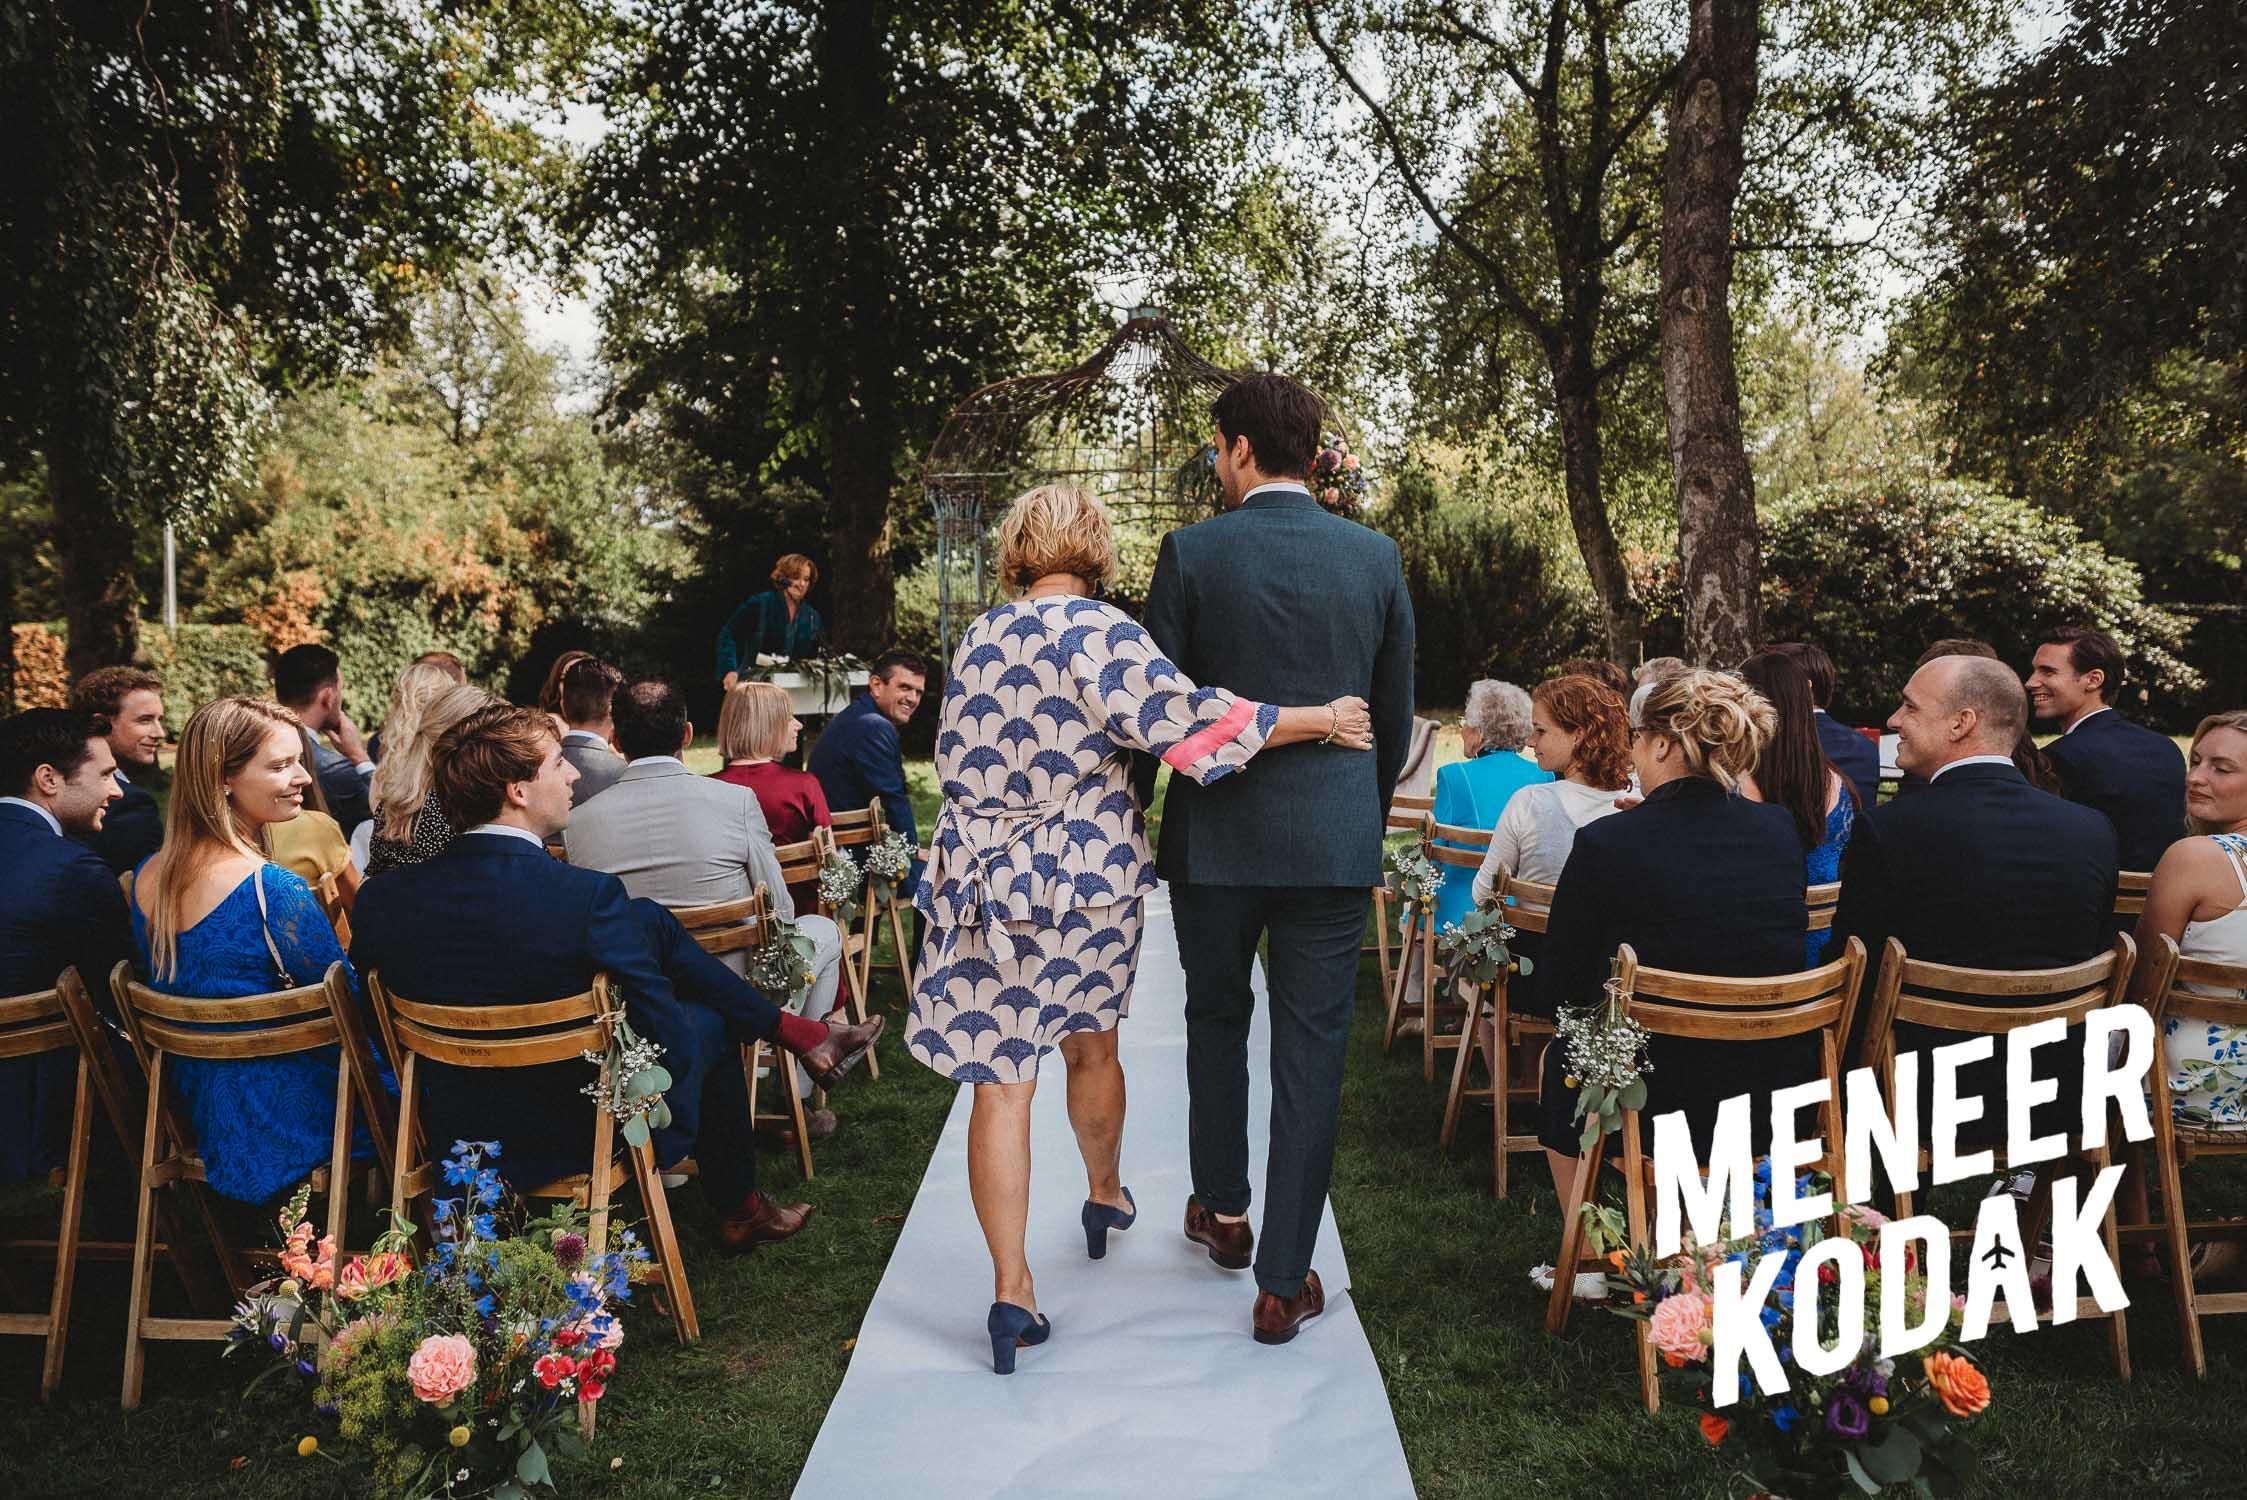 Meneer Kodak - Trouwreportage - Breda - E&M-091.jpg